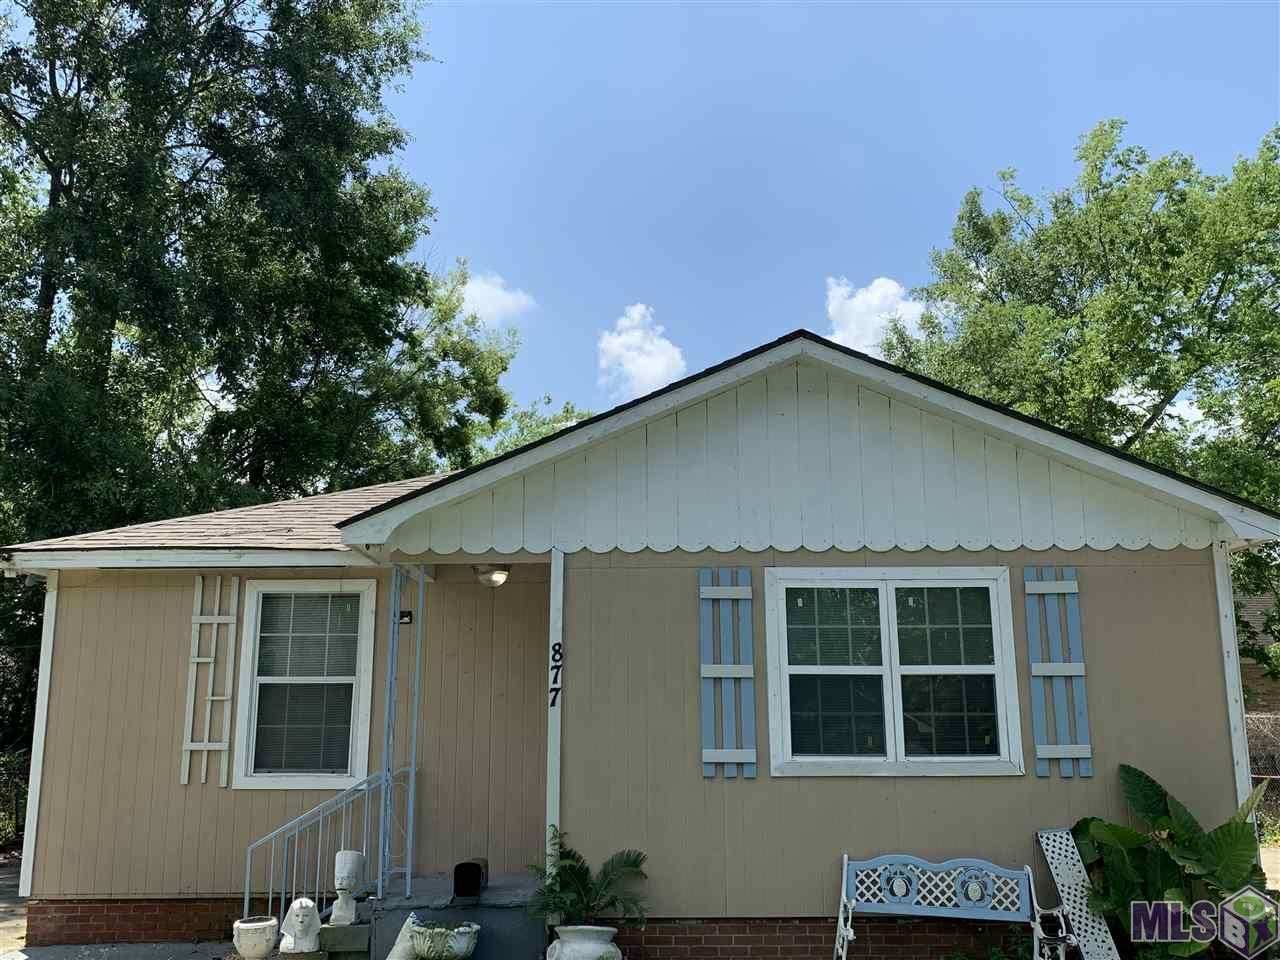 877 W MCKINLEY DR, Baton Rouge, LA 70802 - MLS#: 2020016428